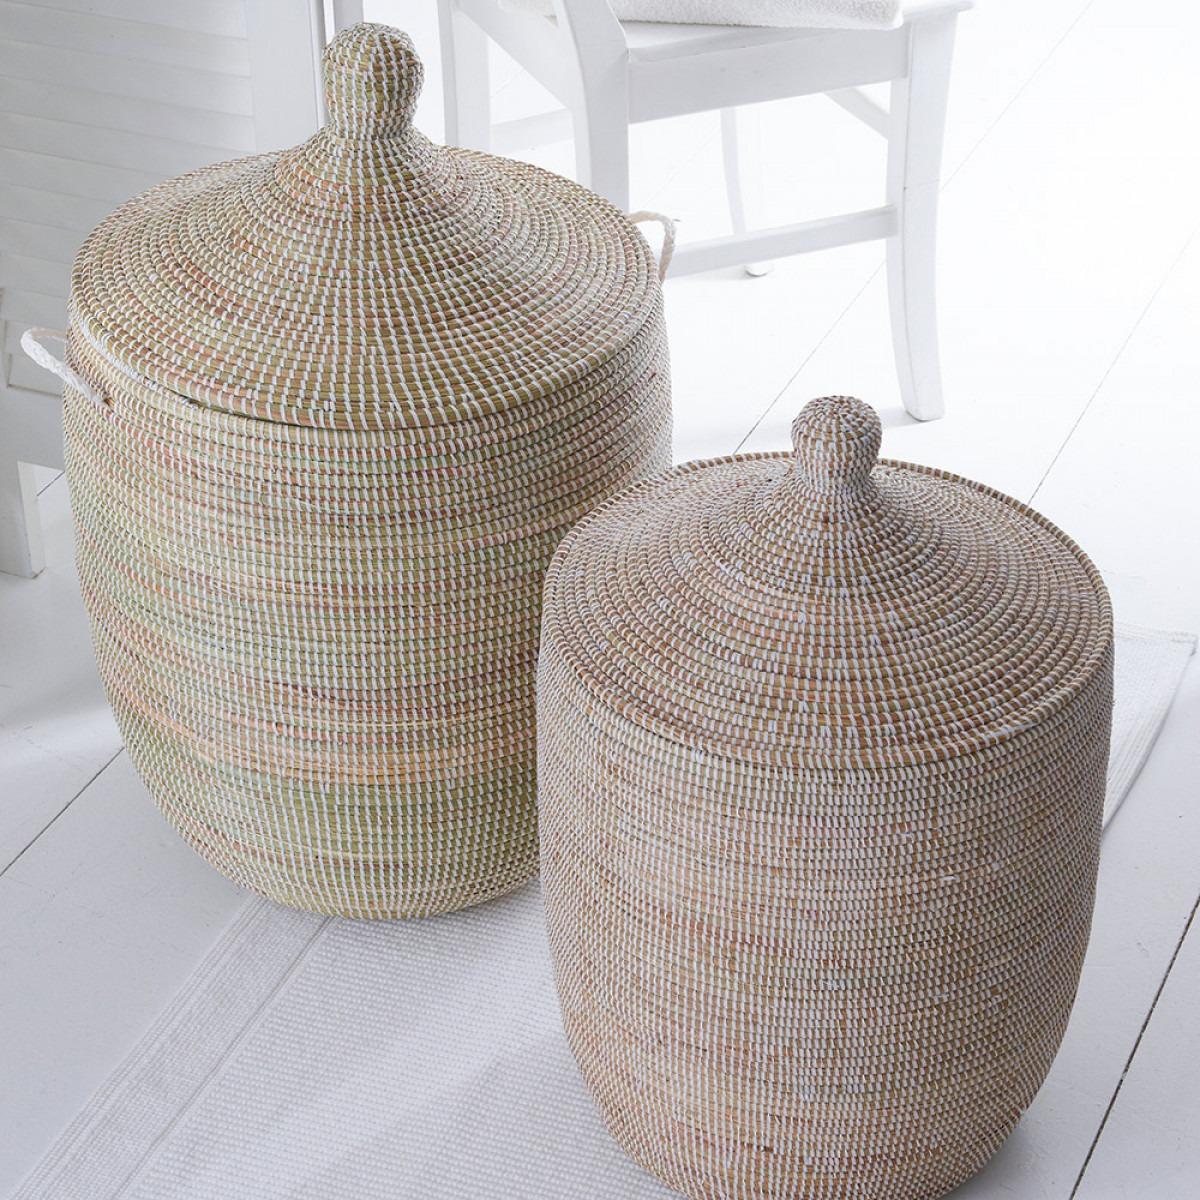 Hand Woven Ali Baba Laundry Baskets